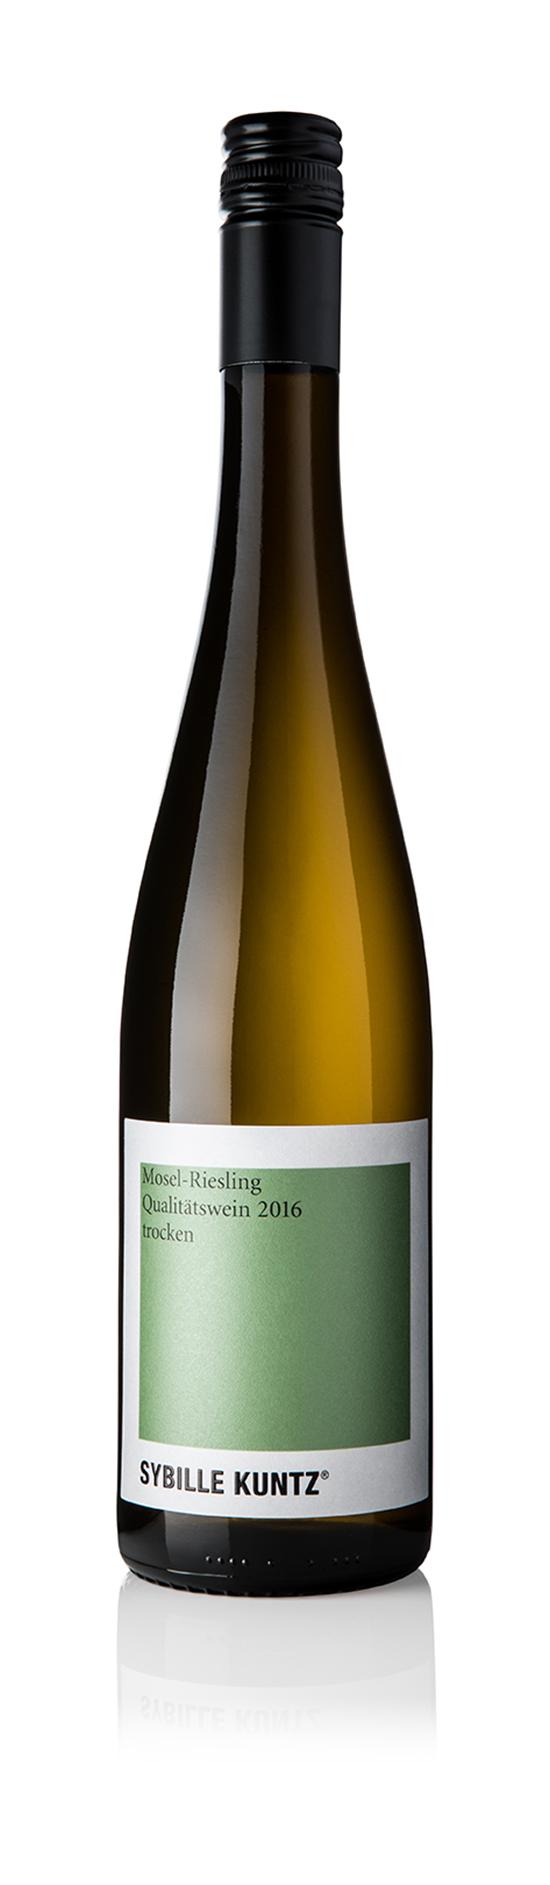 2016 SYBILLE KUNTZ Mosel-Riesling Qualitätswein trocken 0,75 l